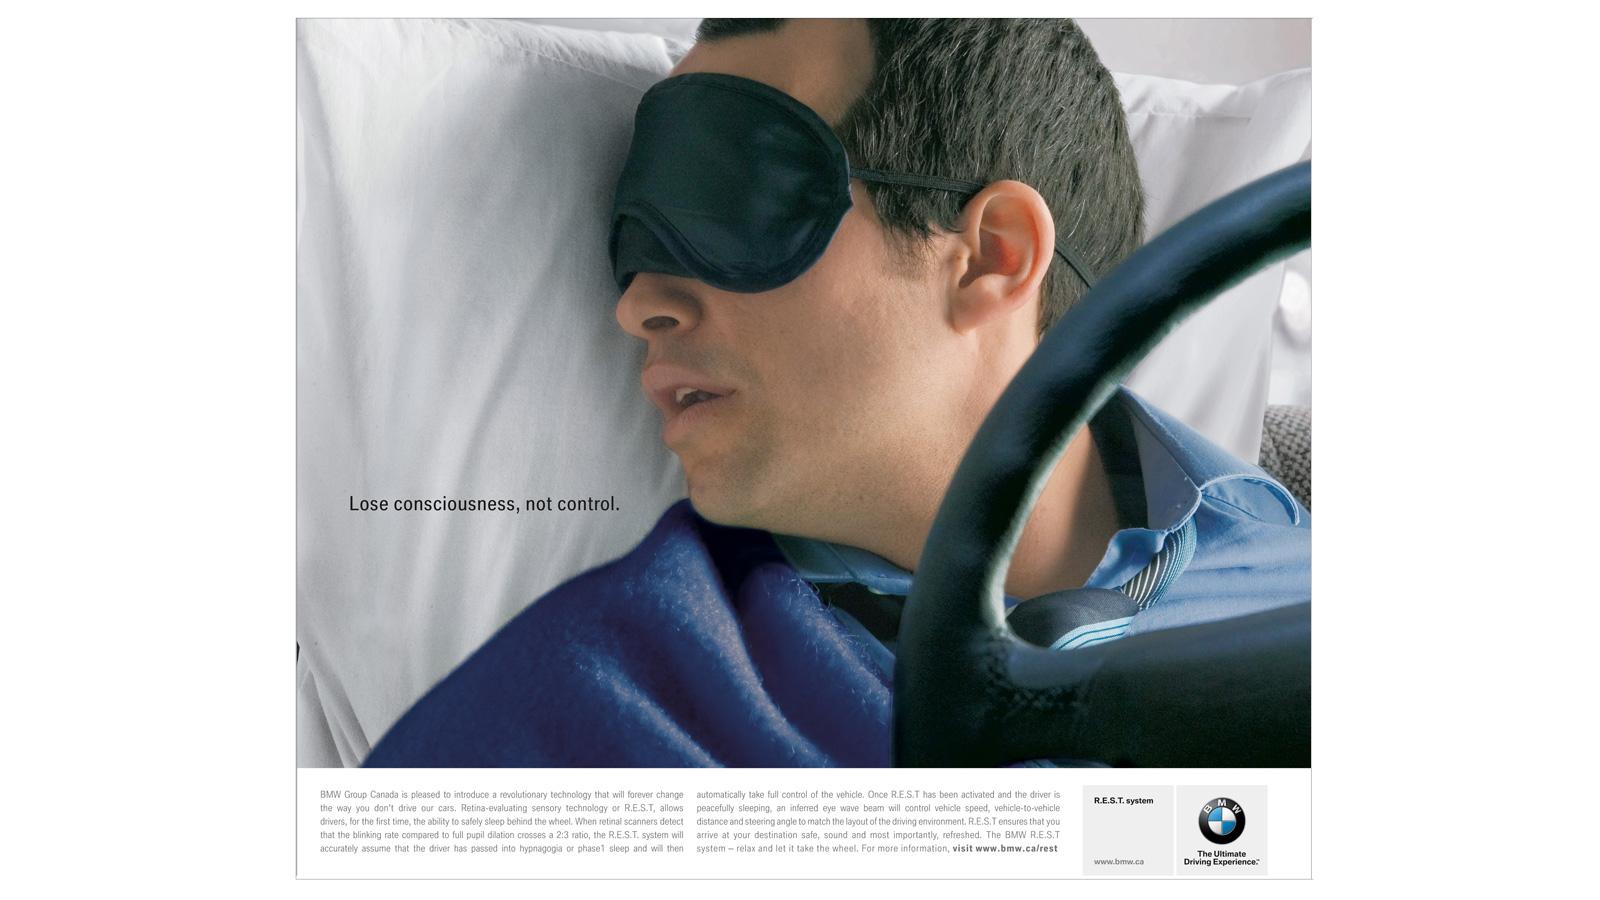 BMW Canada | April Fool's Campaign | Digital Marketing, Website Design & Development